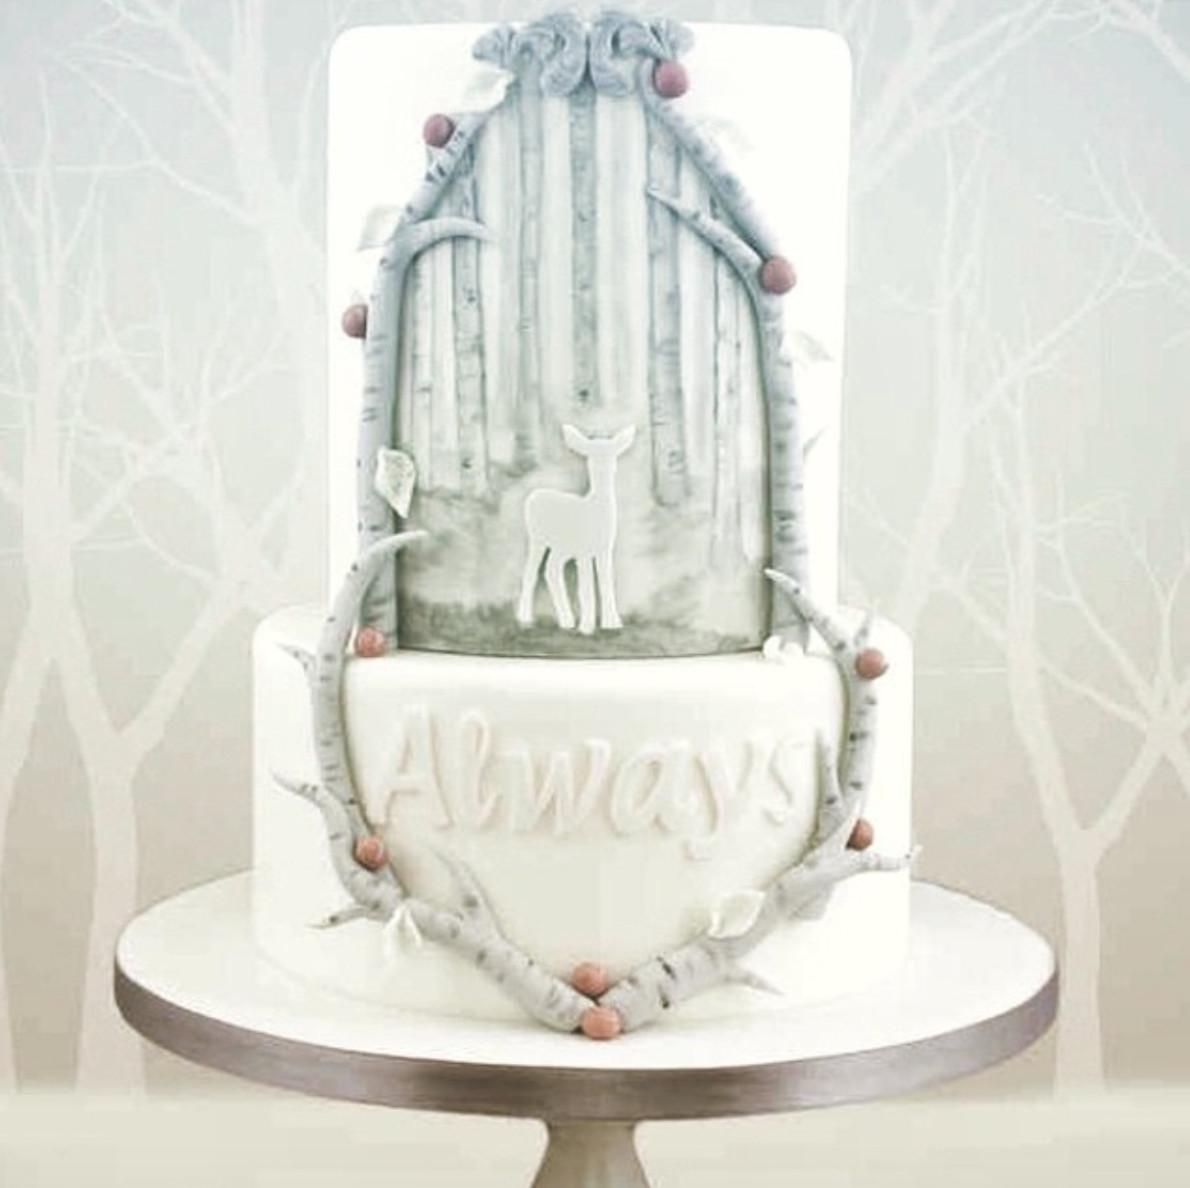 Harry Potter Wedding Cakes  Harry Potter Wedding Cakes